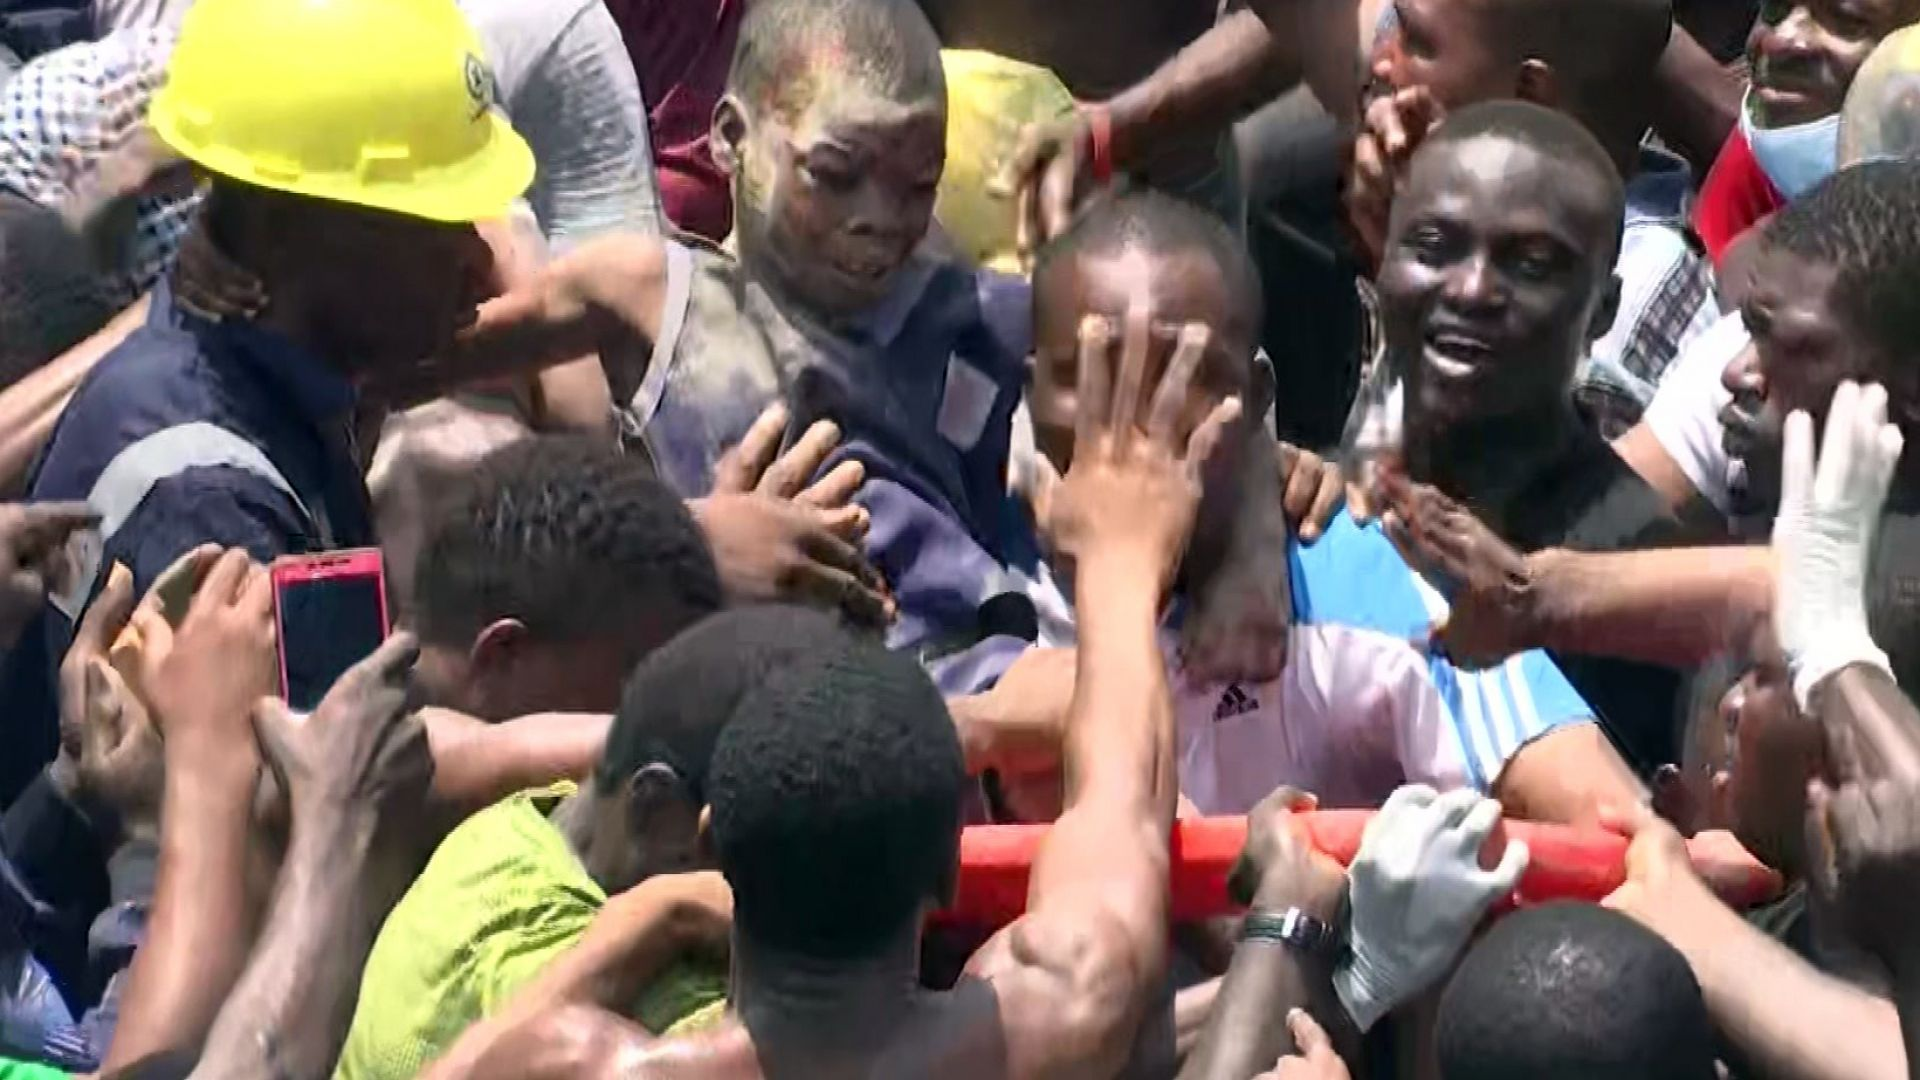 Рухнала сграда с училище затрупа над 100 души в Нигерия